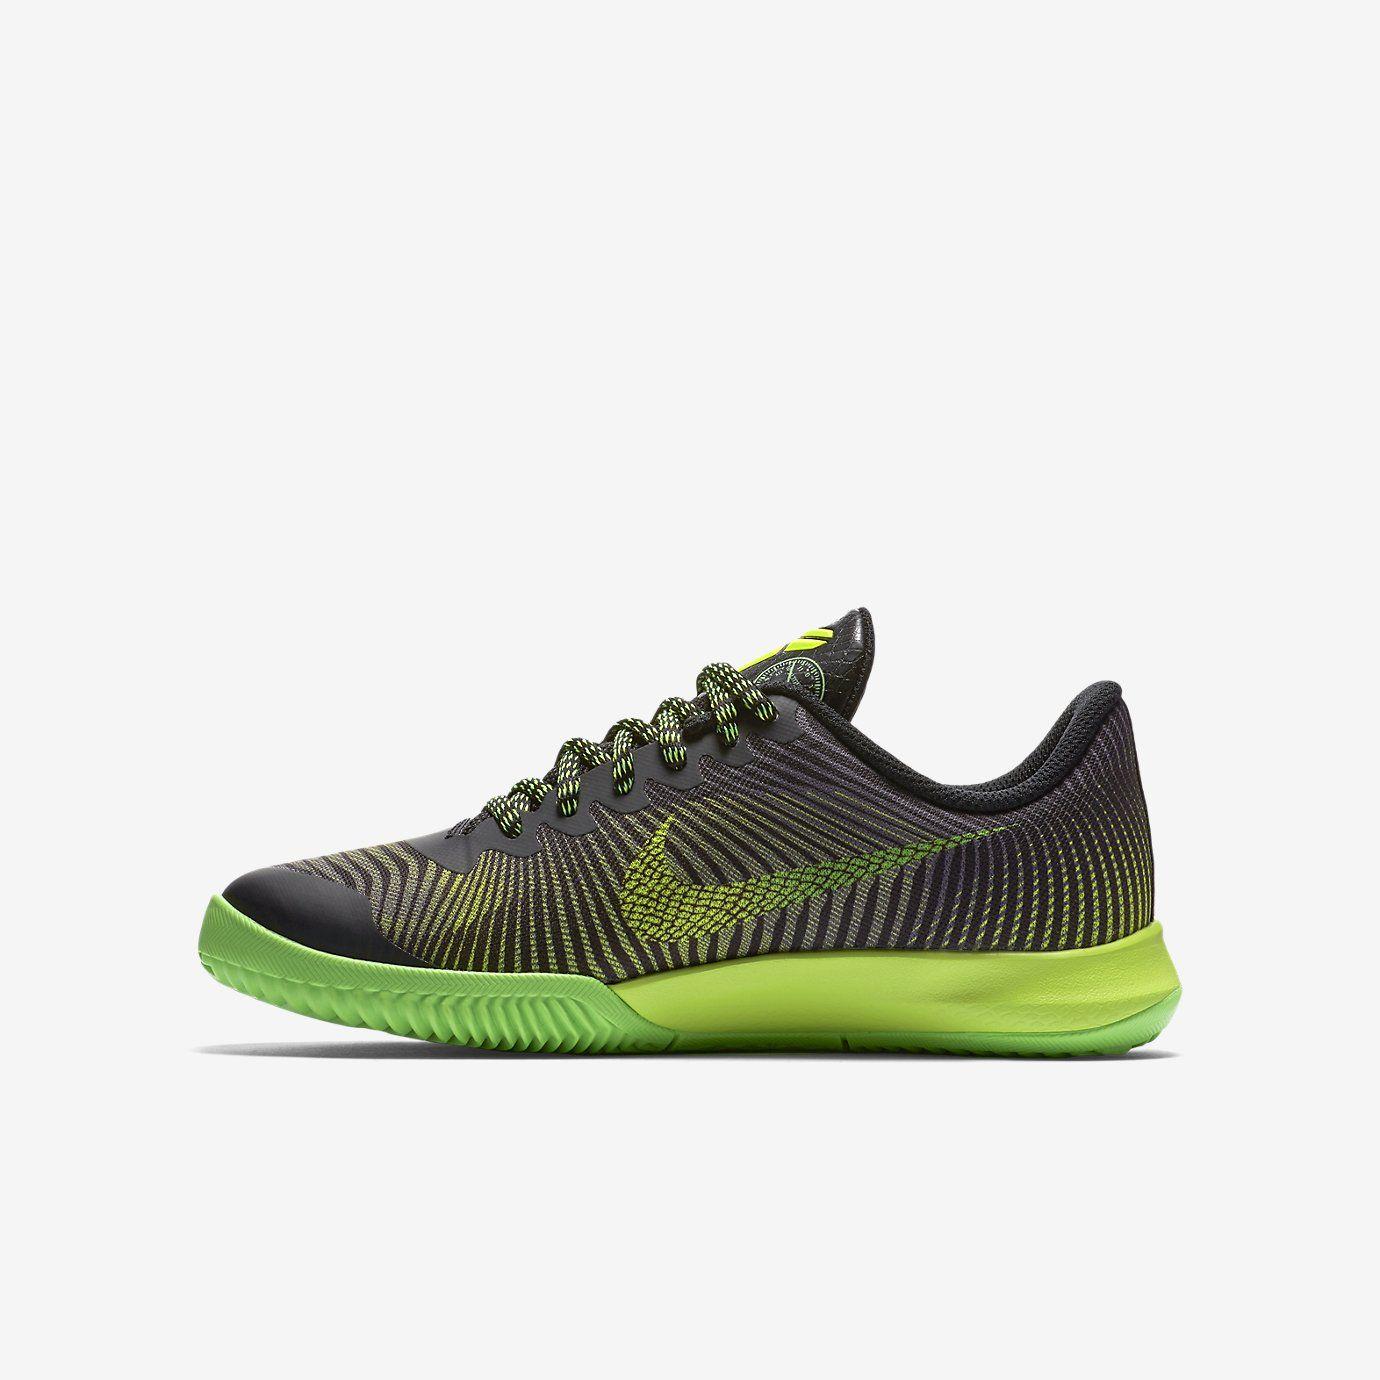 half off d2e73 32991 Kobe Mentality 2 (3.5y-7y) Big Kids  Basketball Shoe. Nike.com